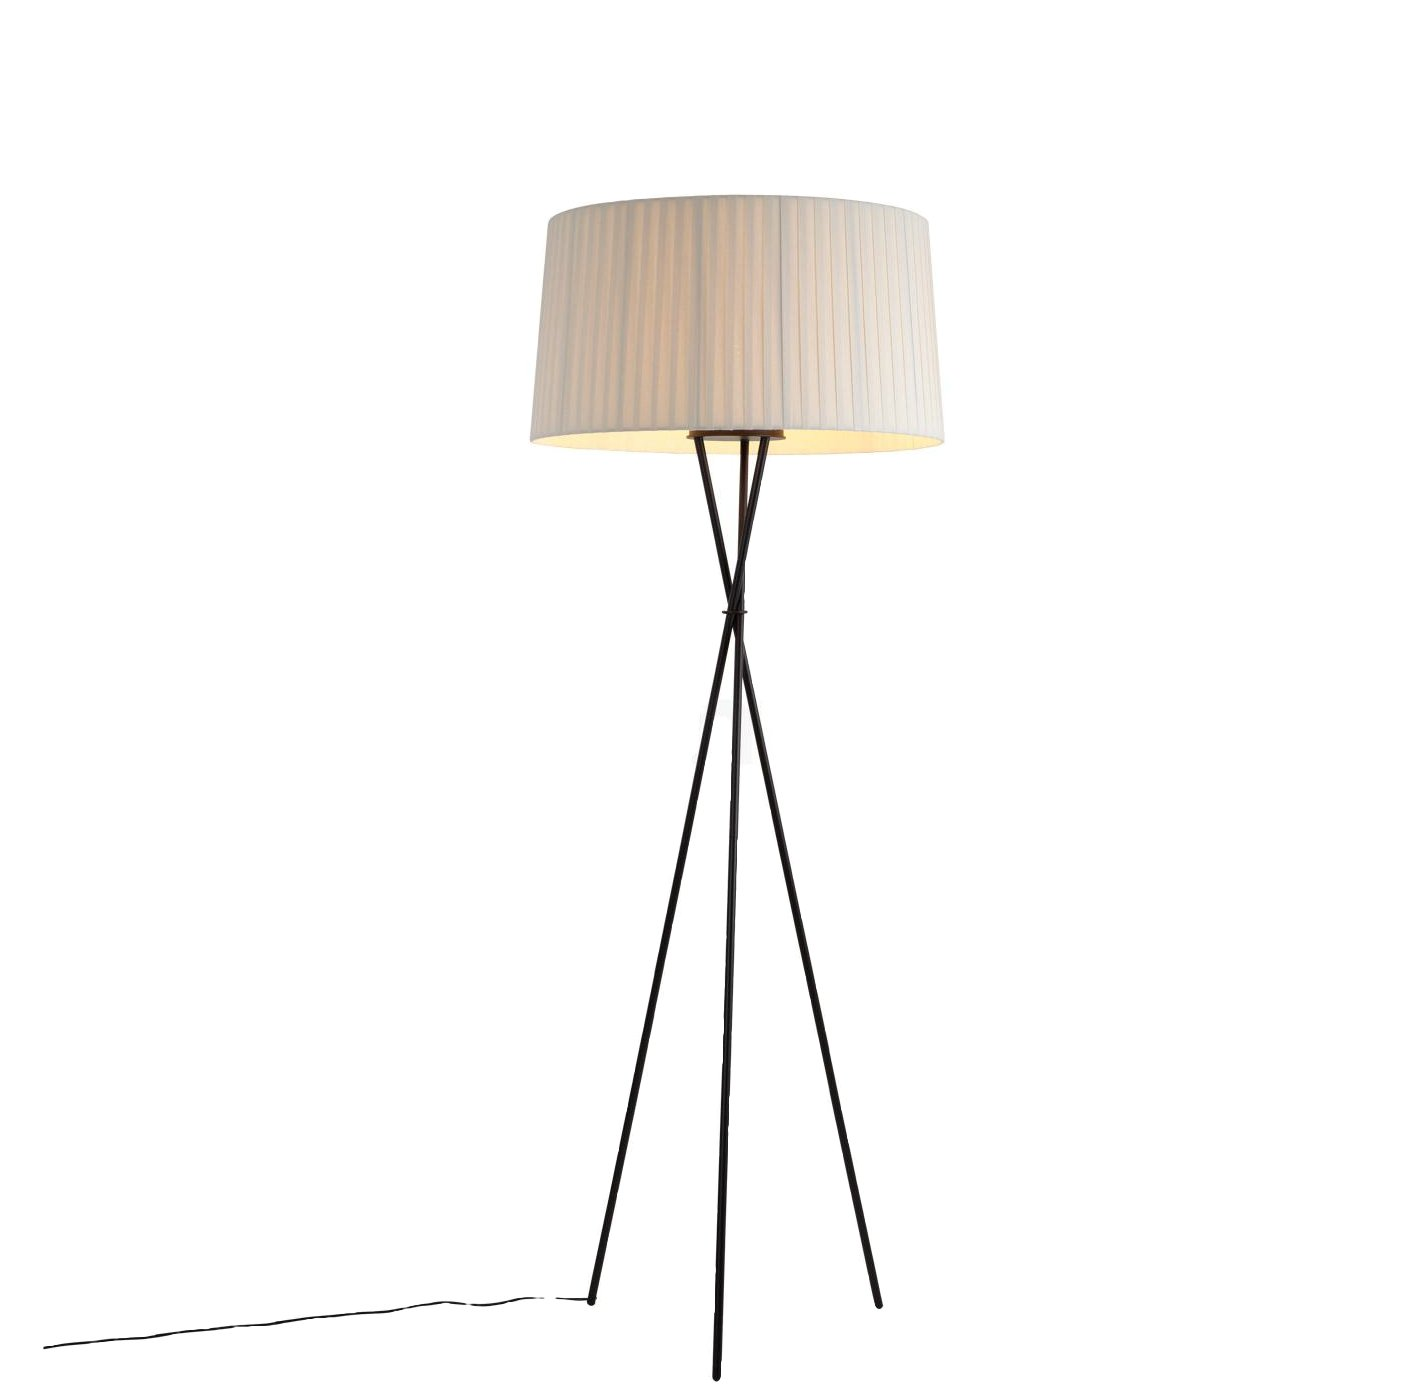 Santa U0026 Cole Tripode G5 Natural Shade Floor Lamp / Light: Amazon.co.uk:  Lighting